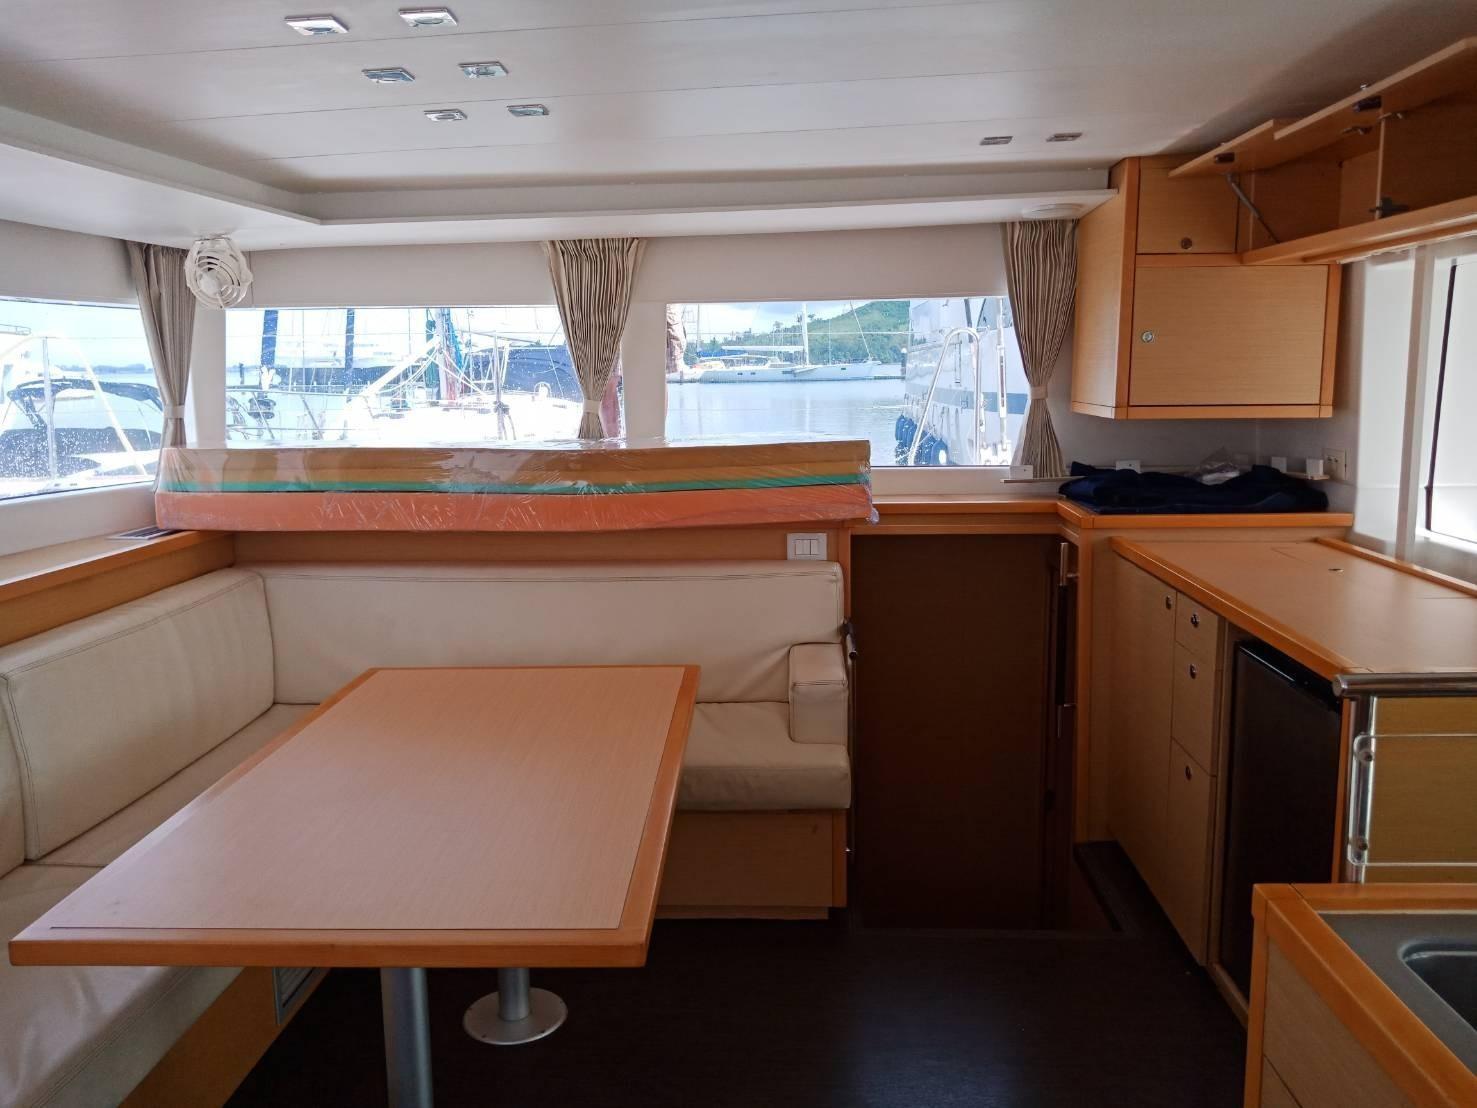 Used Sail Catamaran for Sale 2013 Lagoon 450 Layout & Accommodations